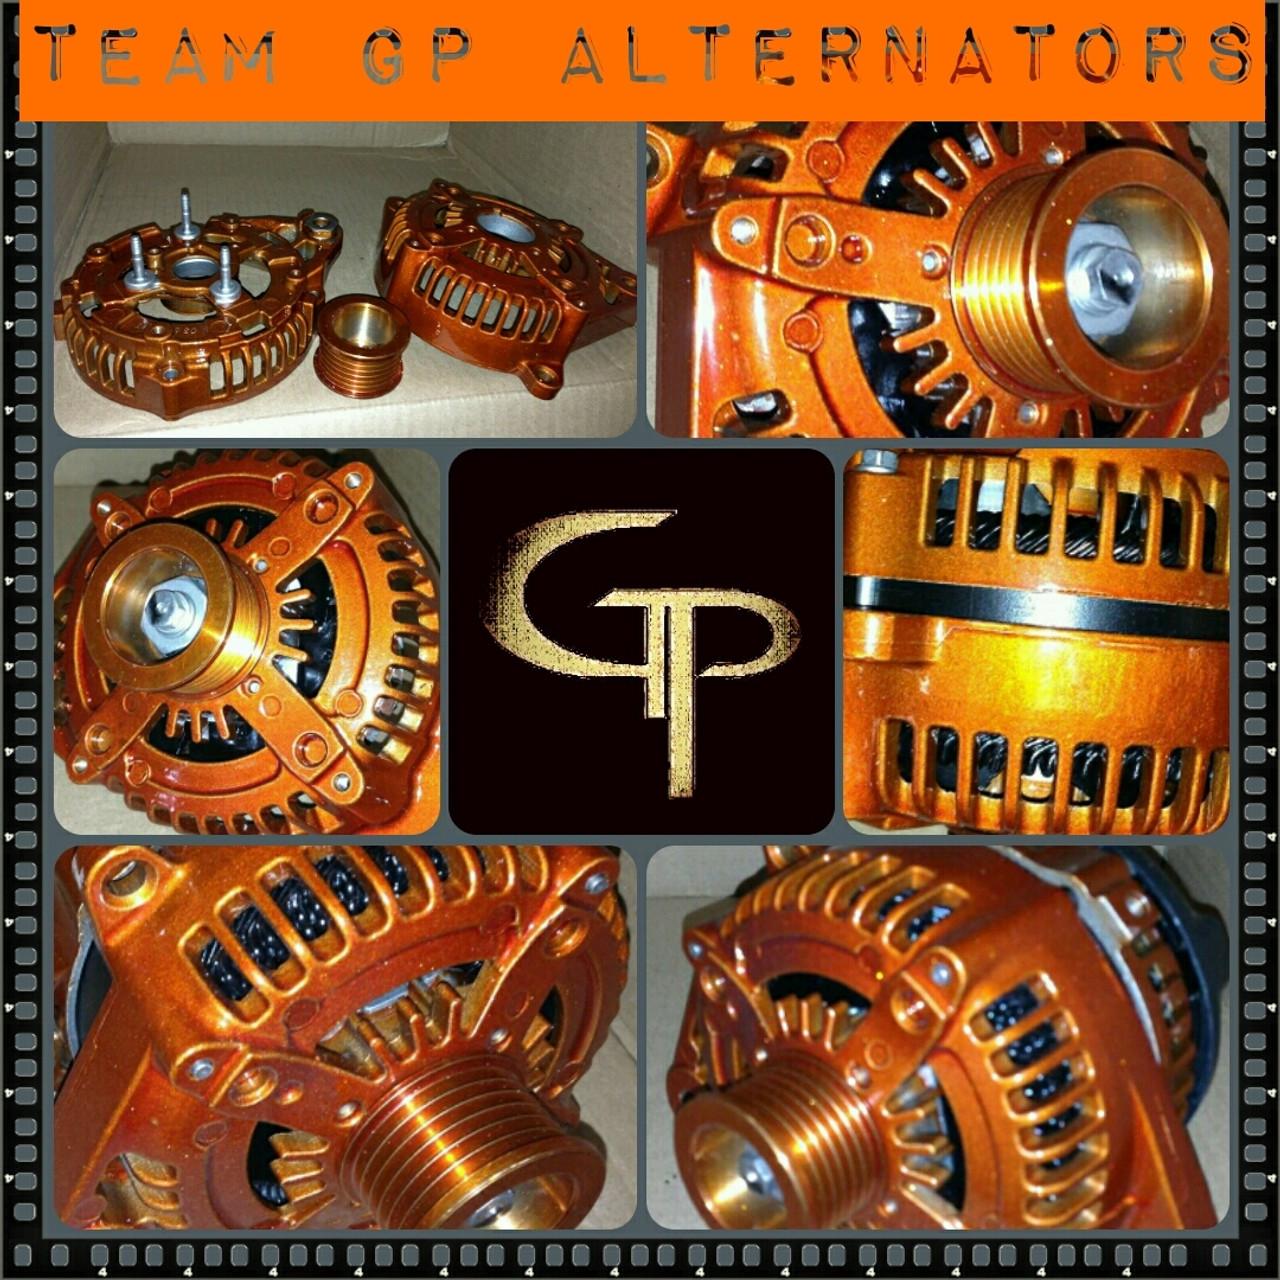 TOYOTA CAMRY 2.0 -1988- 160AMP TEAM GP Alternator